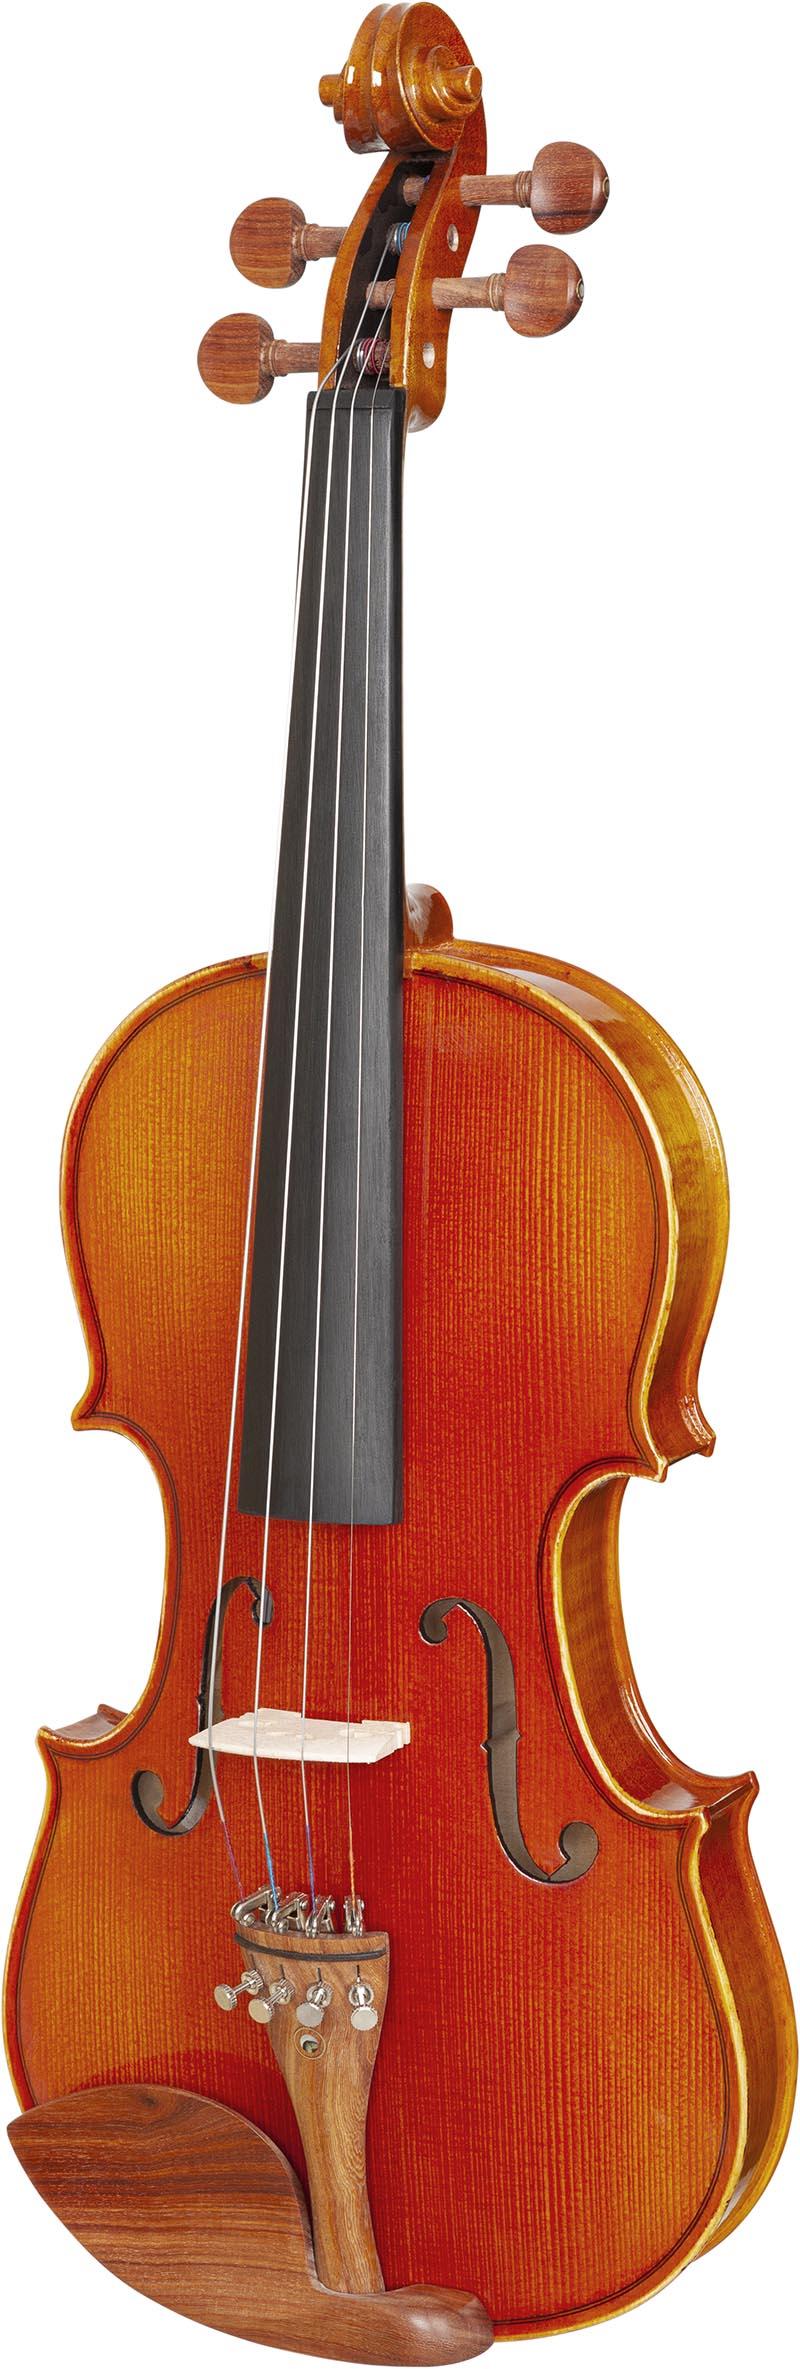 ve445 violino eagle ve445 visao frontal vertical